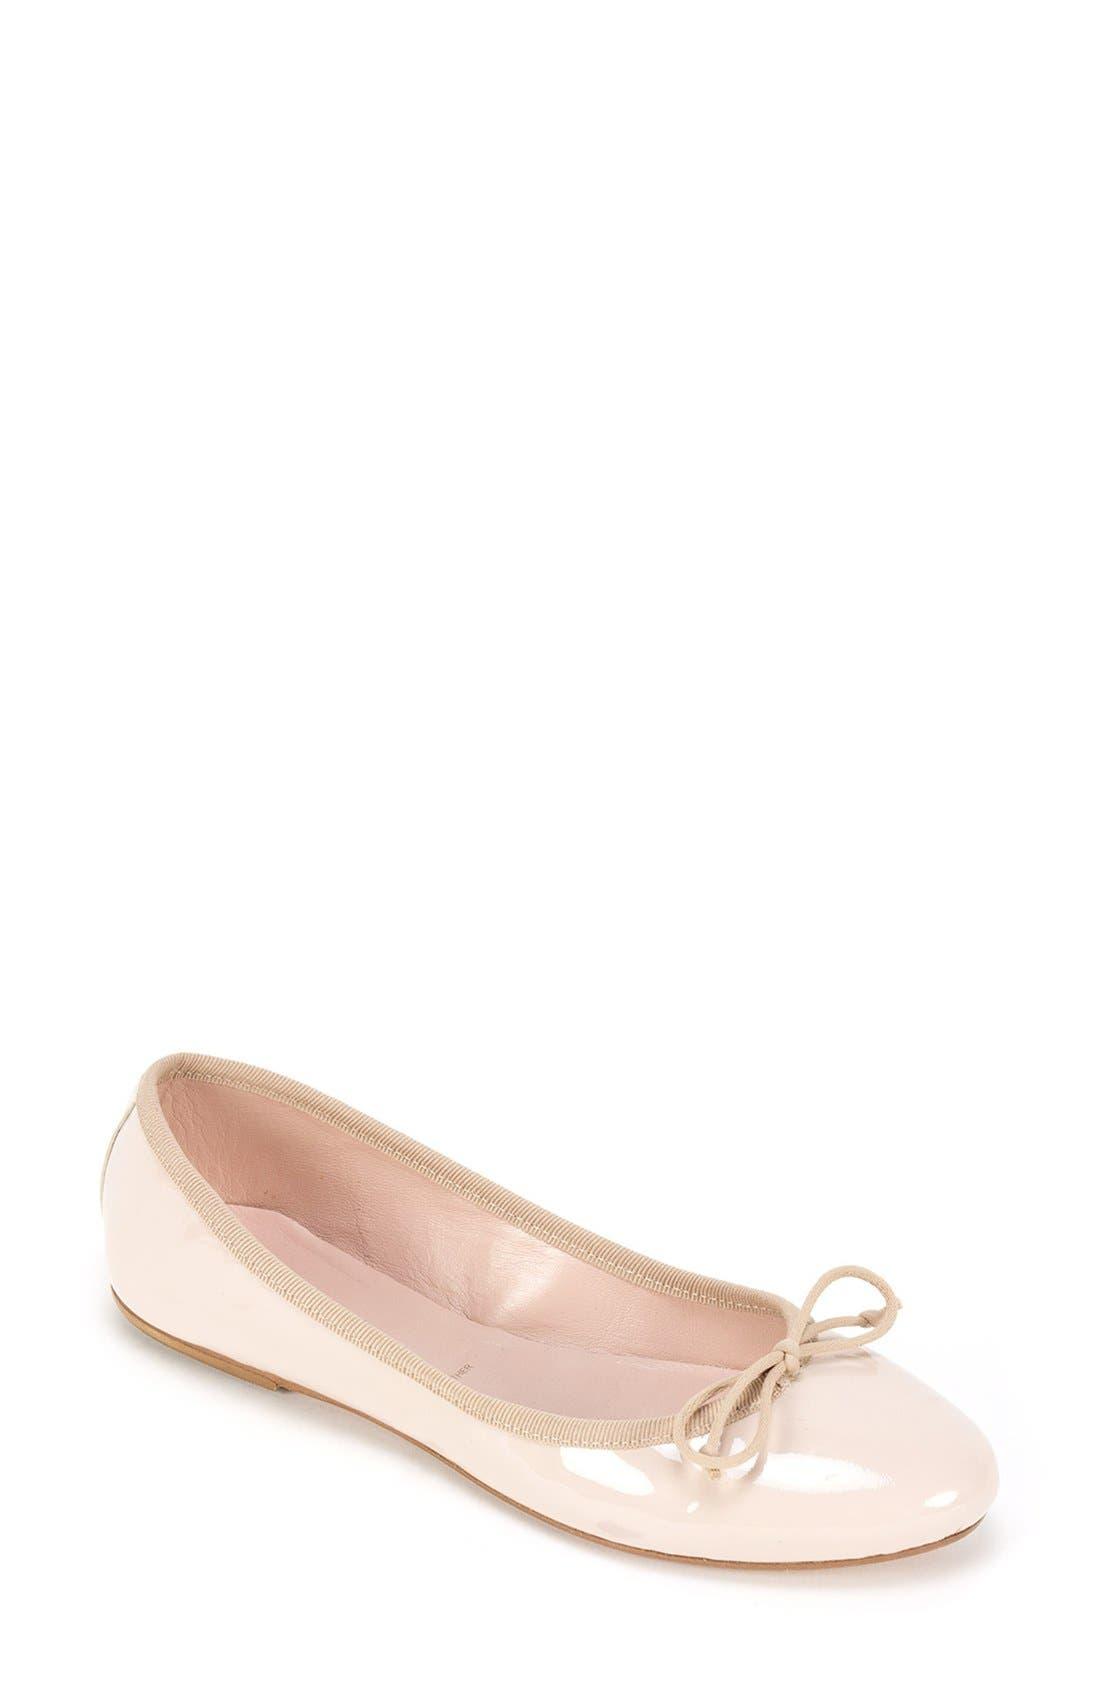 'Kendall' Ballet Flat,                         Main,                         color, 251